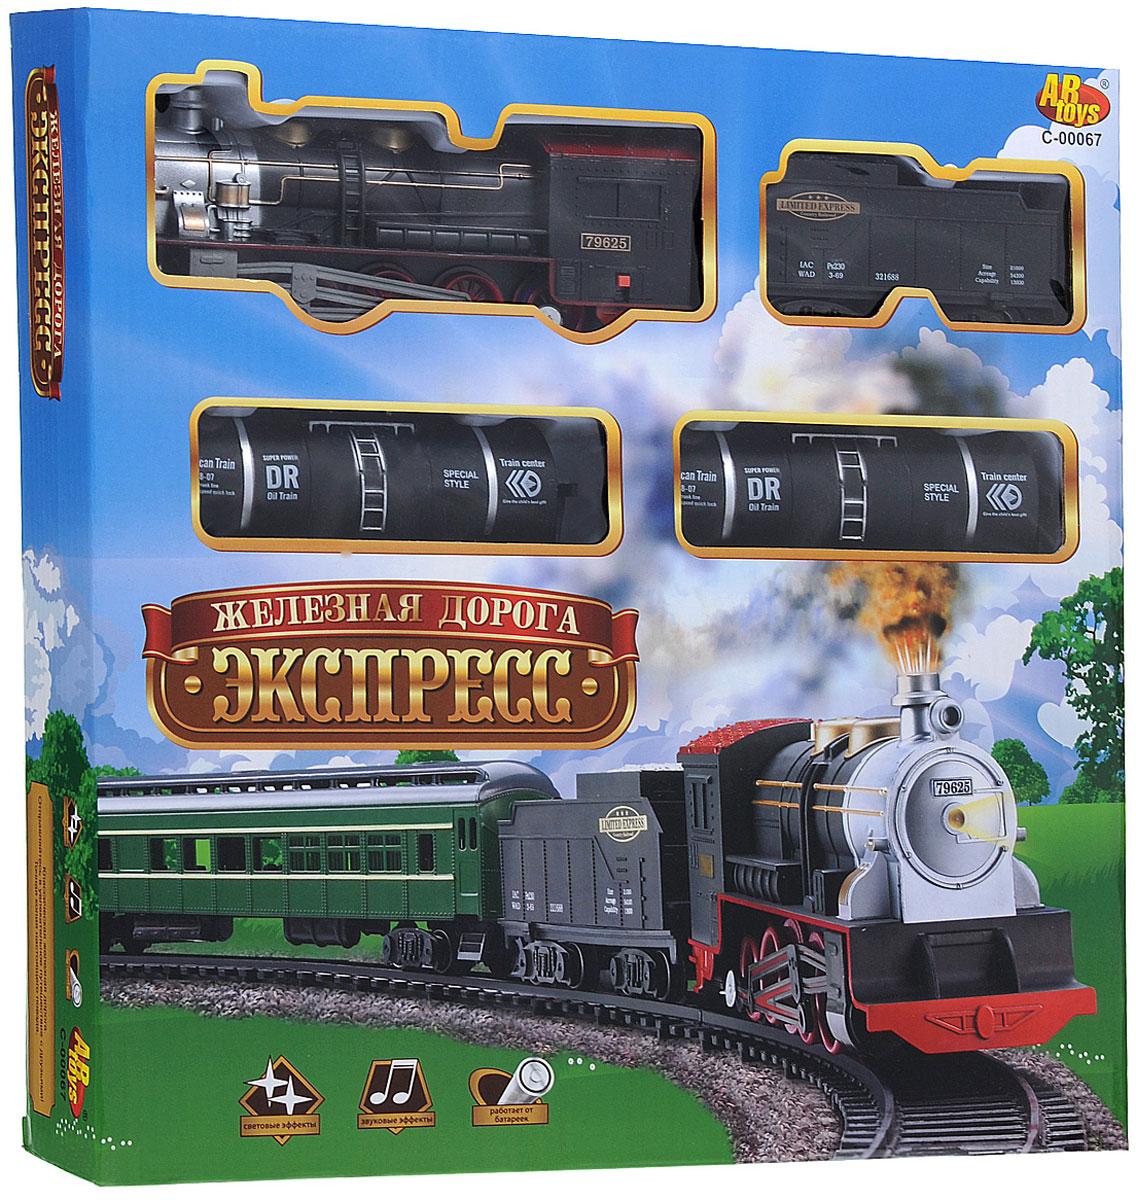 ABtoys Железная дорога Экспресс 16 элементов abtoys железная дорога 13 предметов